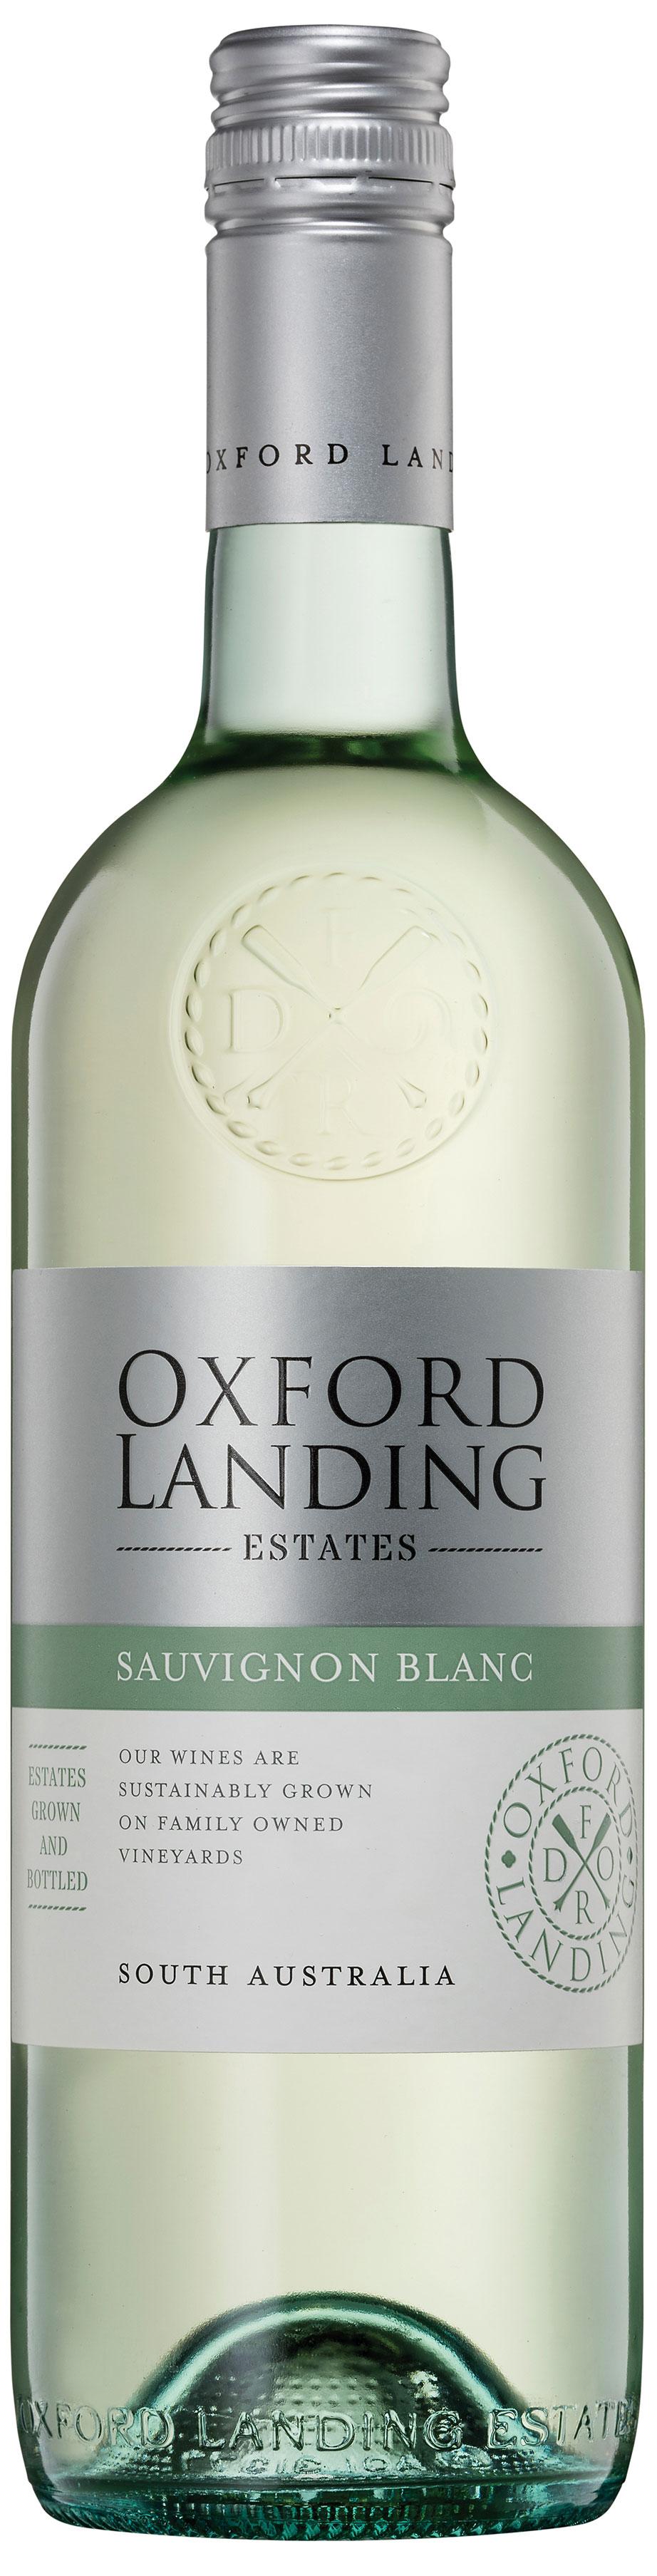 https://vinocorpperu.com/images/vinos/oxfordlanding/oxford_landing_estates_sauvignon_blanc_2019.jpg